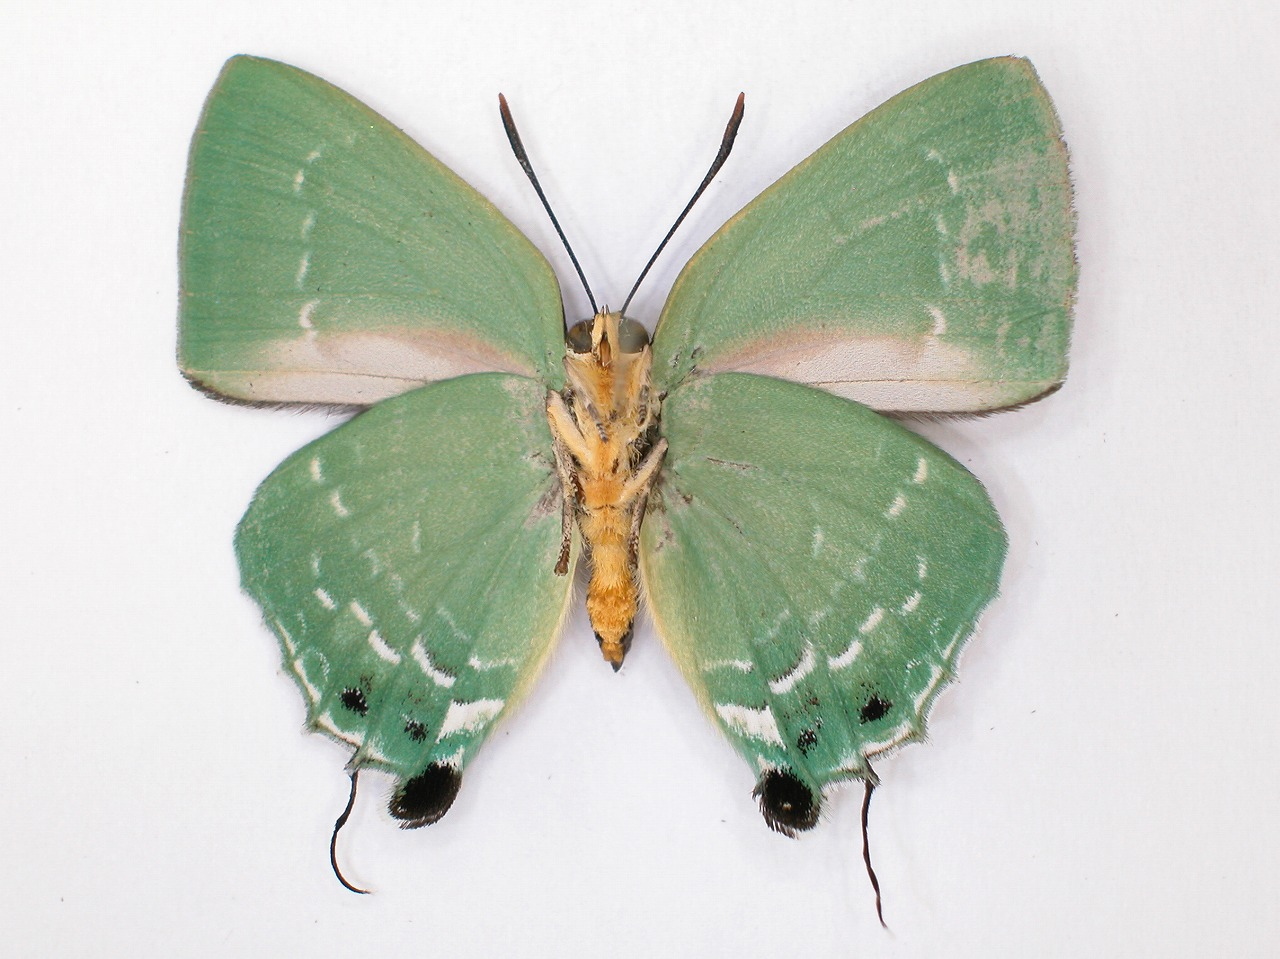 https://www.hitohaku.jp/material/l-material/butterfly-wing/5-lycaenidae/B1-638300_B.jpg